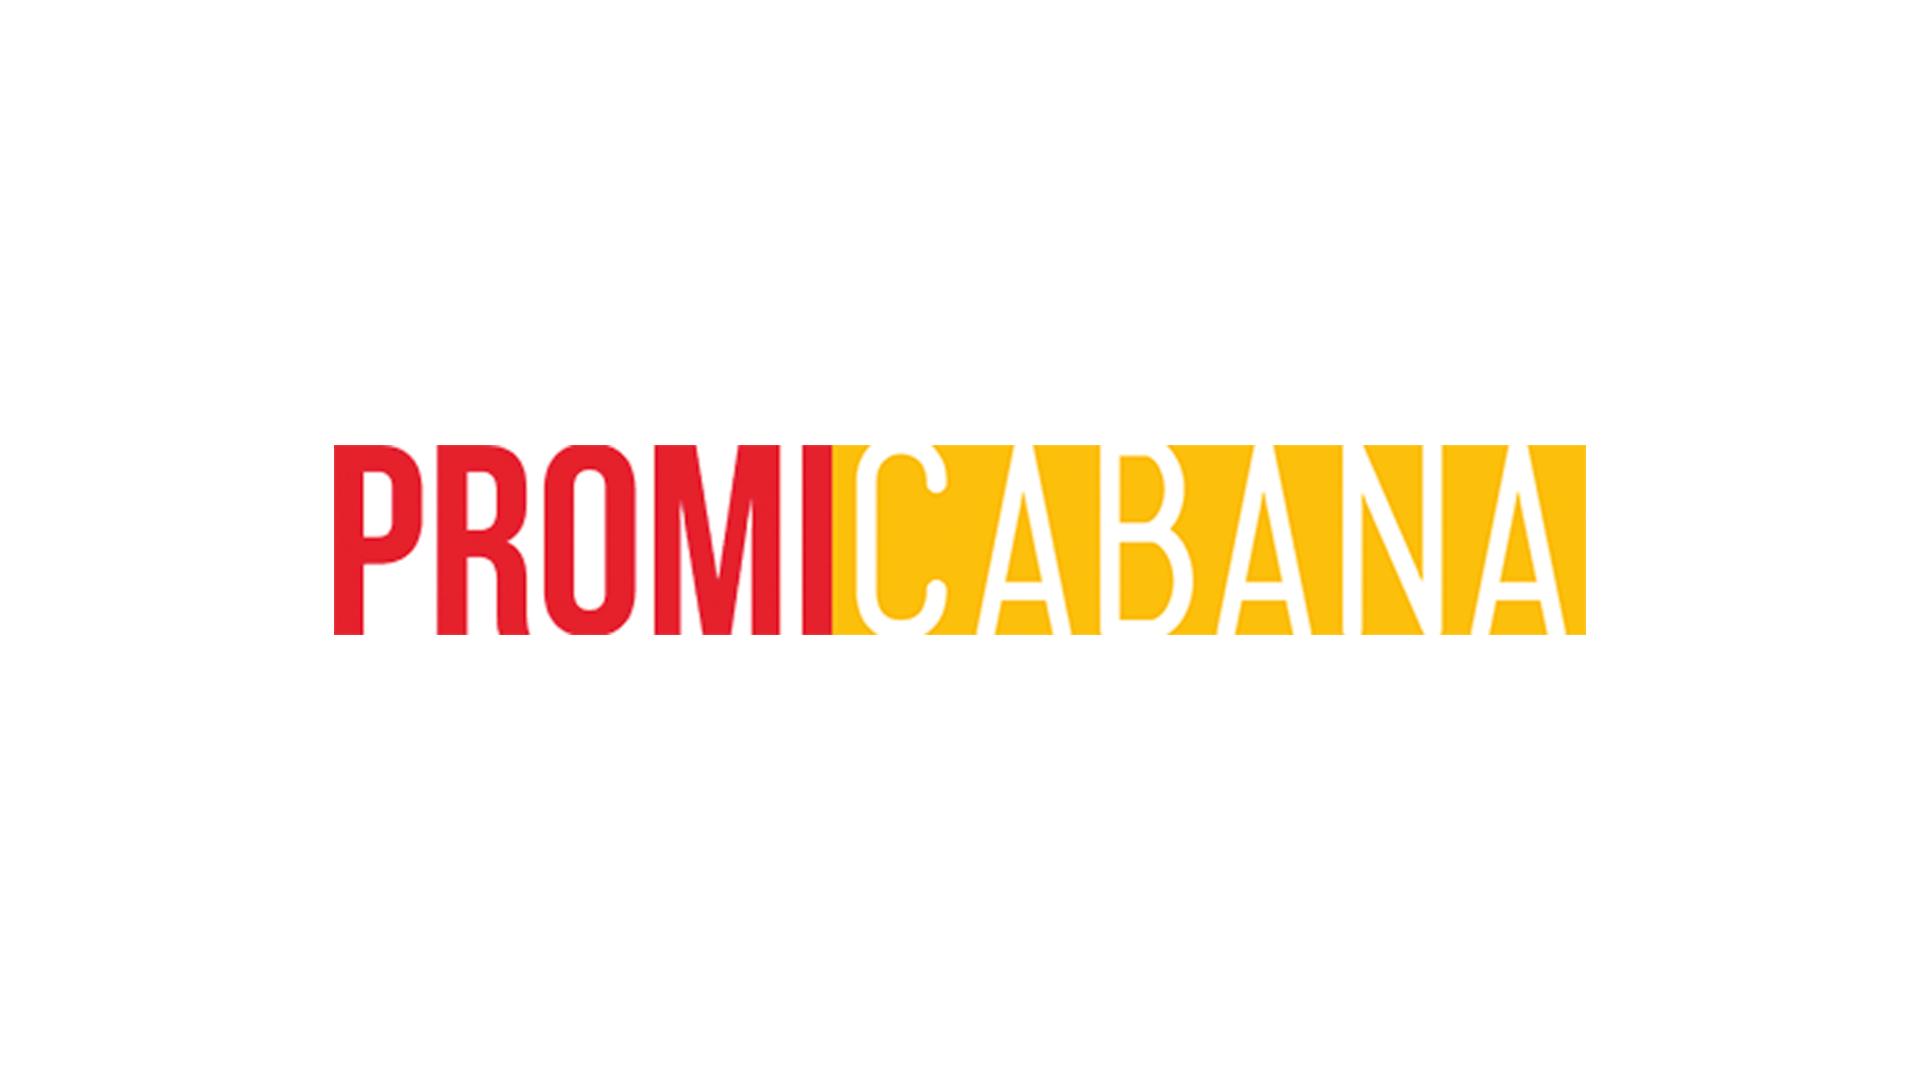 Neil-Patrick-Harris-Puppet-Dreams